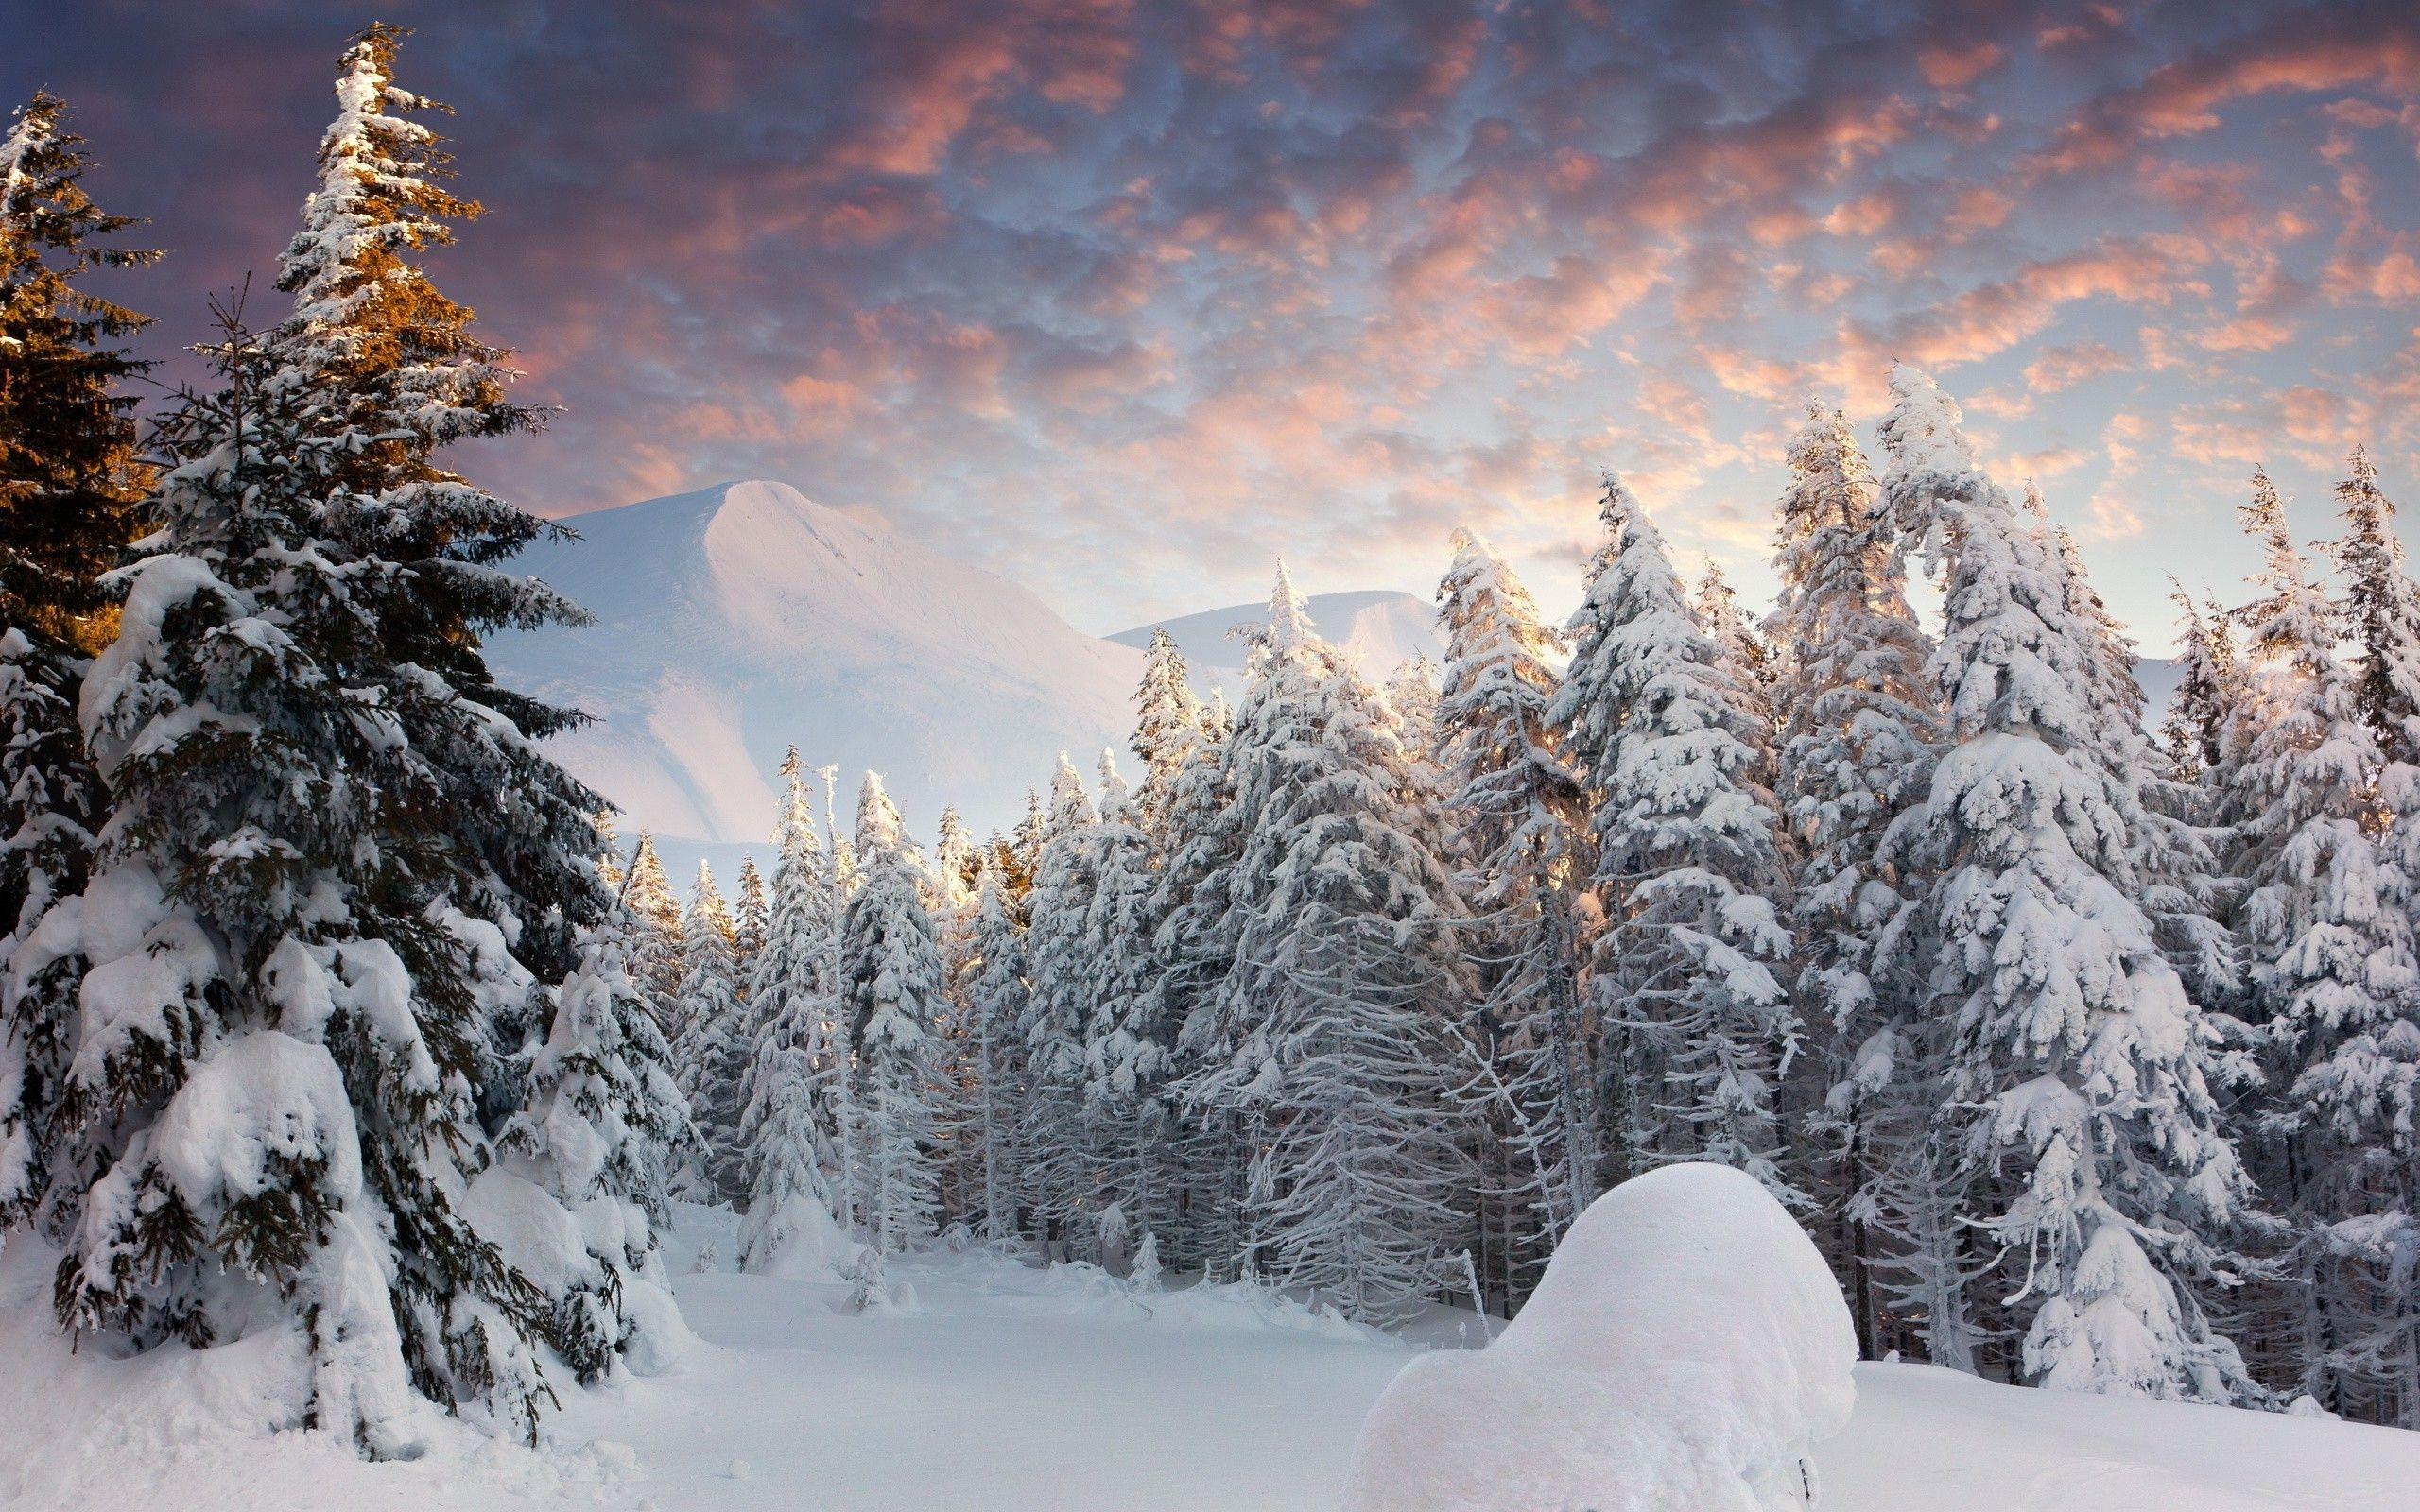 Winter Forest Night Wallpaper